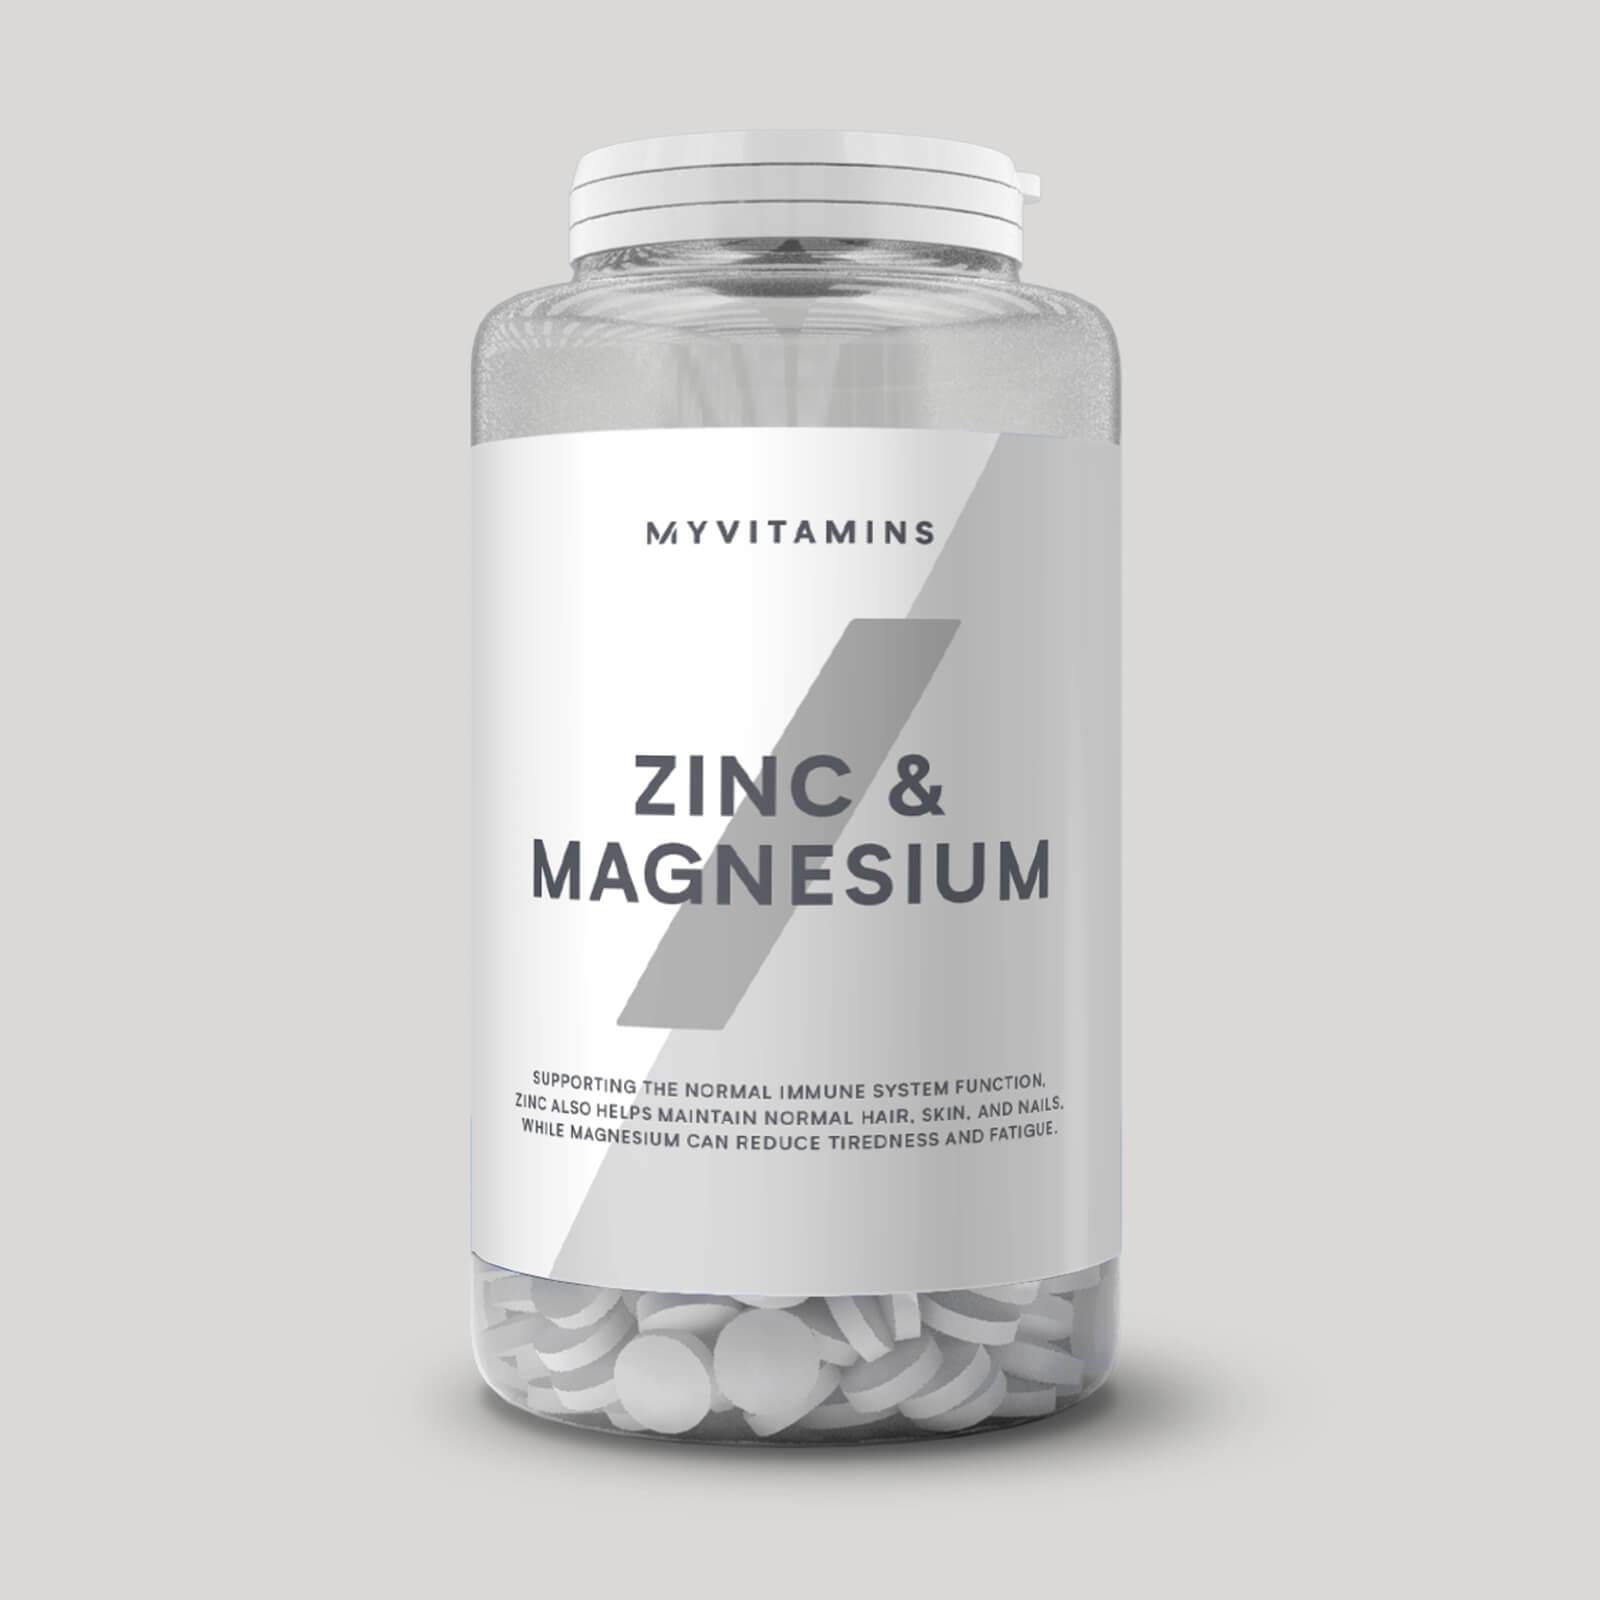 hvorfor spise magnesium